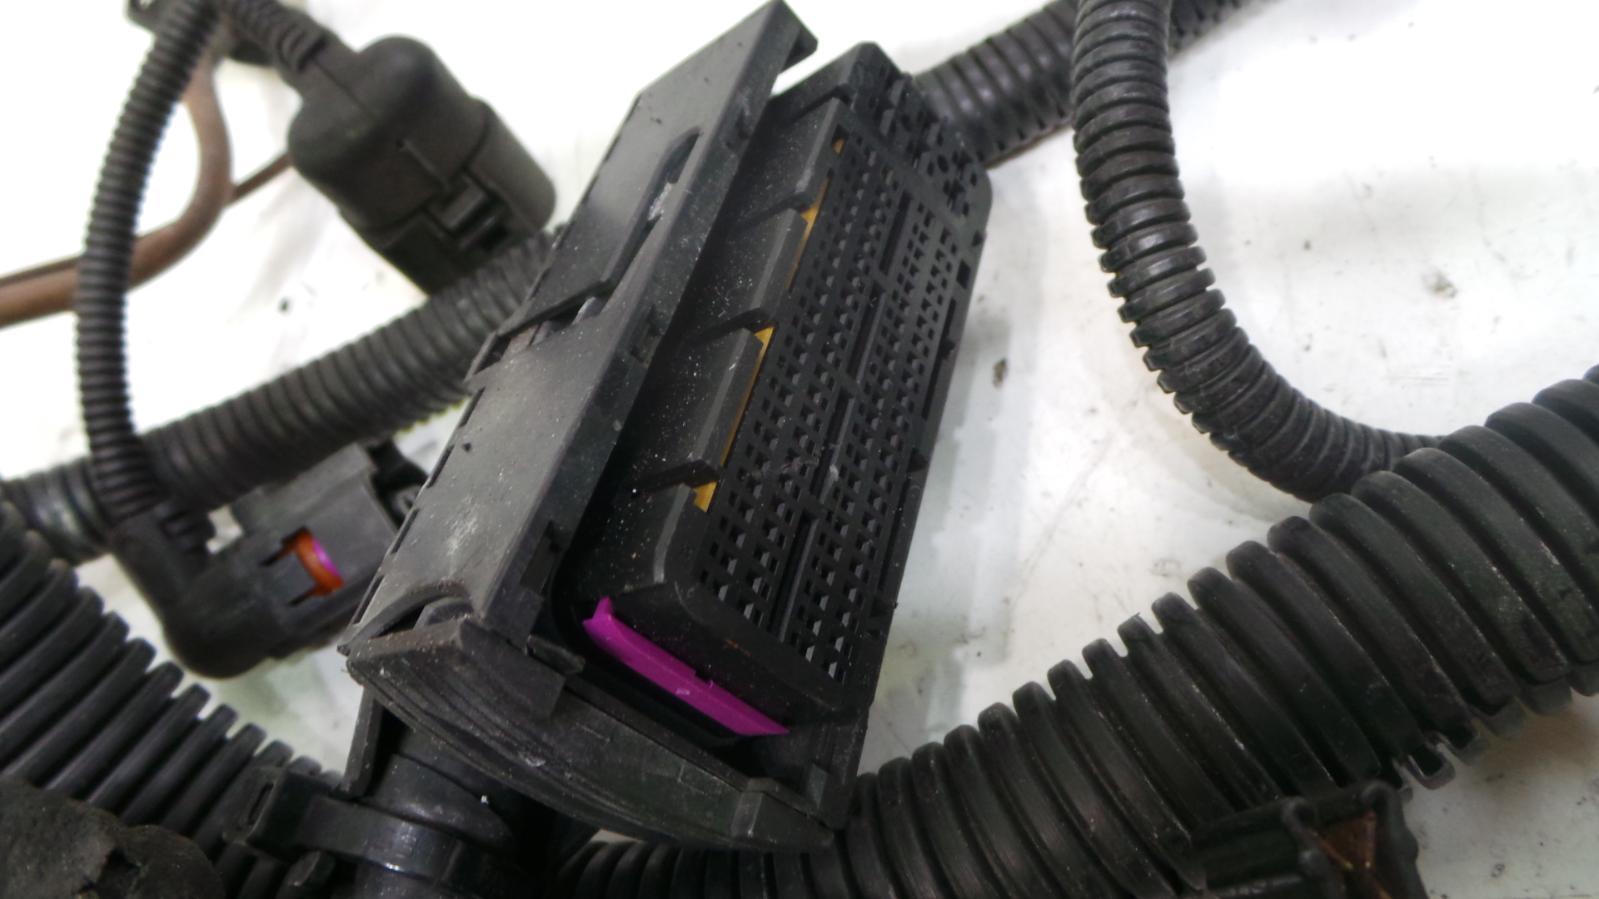 2005 Vw Touareg 25 Diesel Bac Engine Bay Wiring Loom Harness Fuse Box Location 8 Of 12